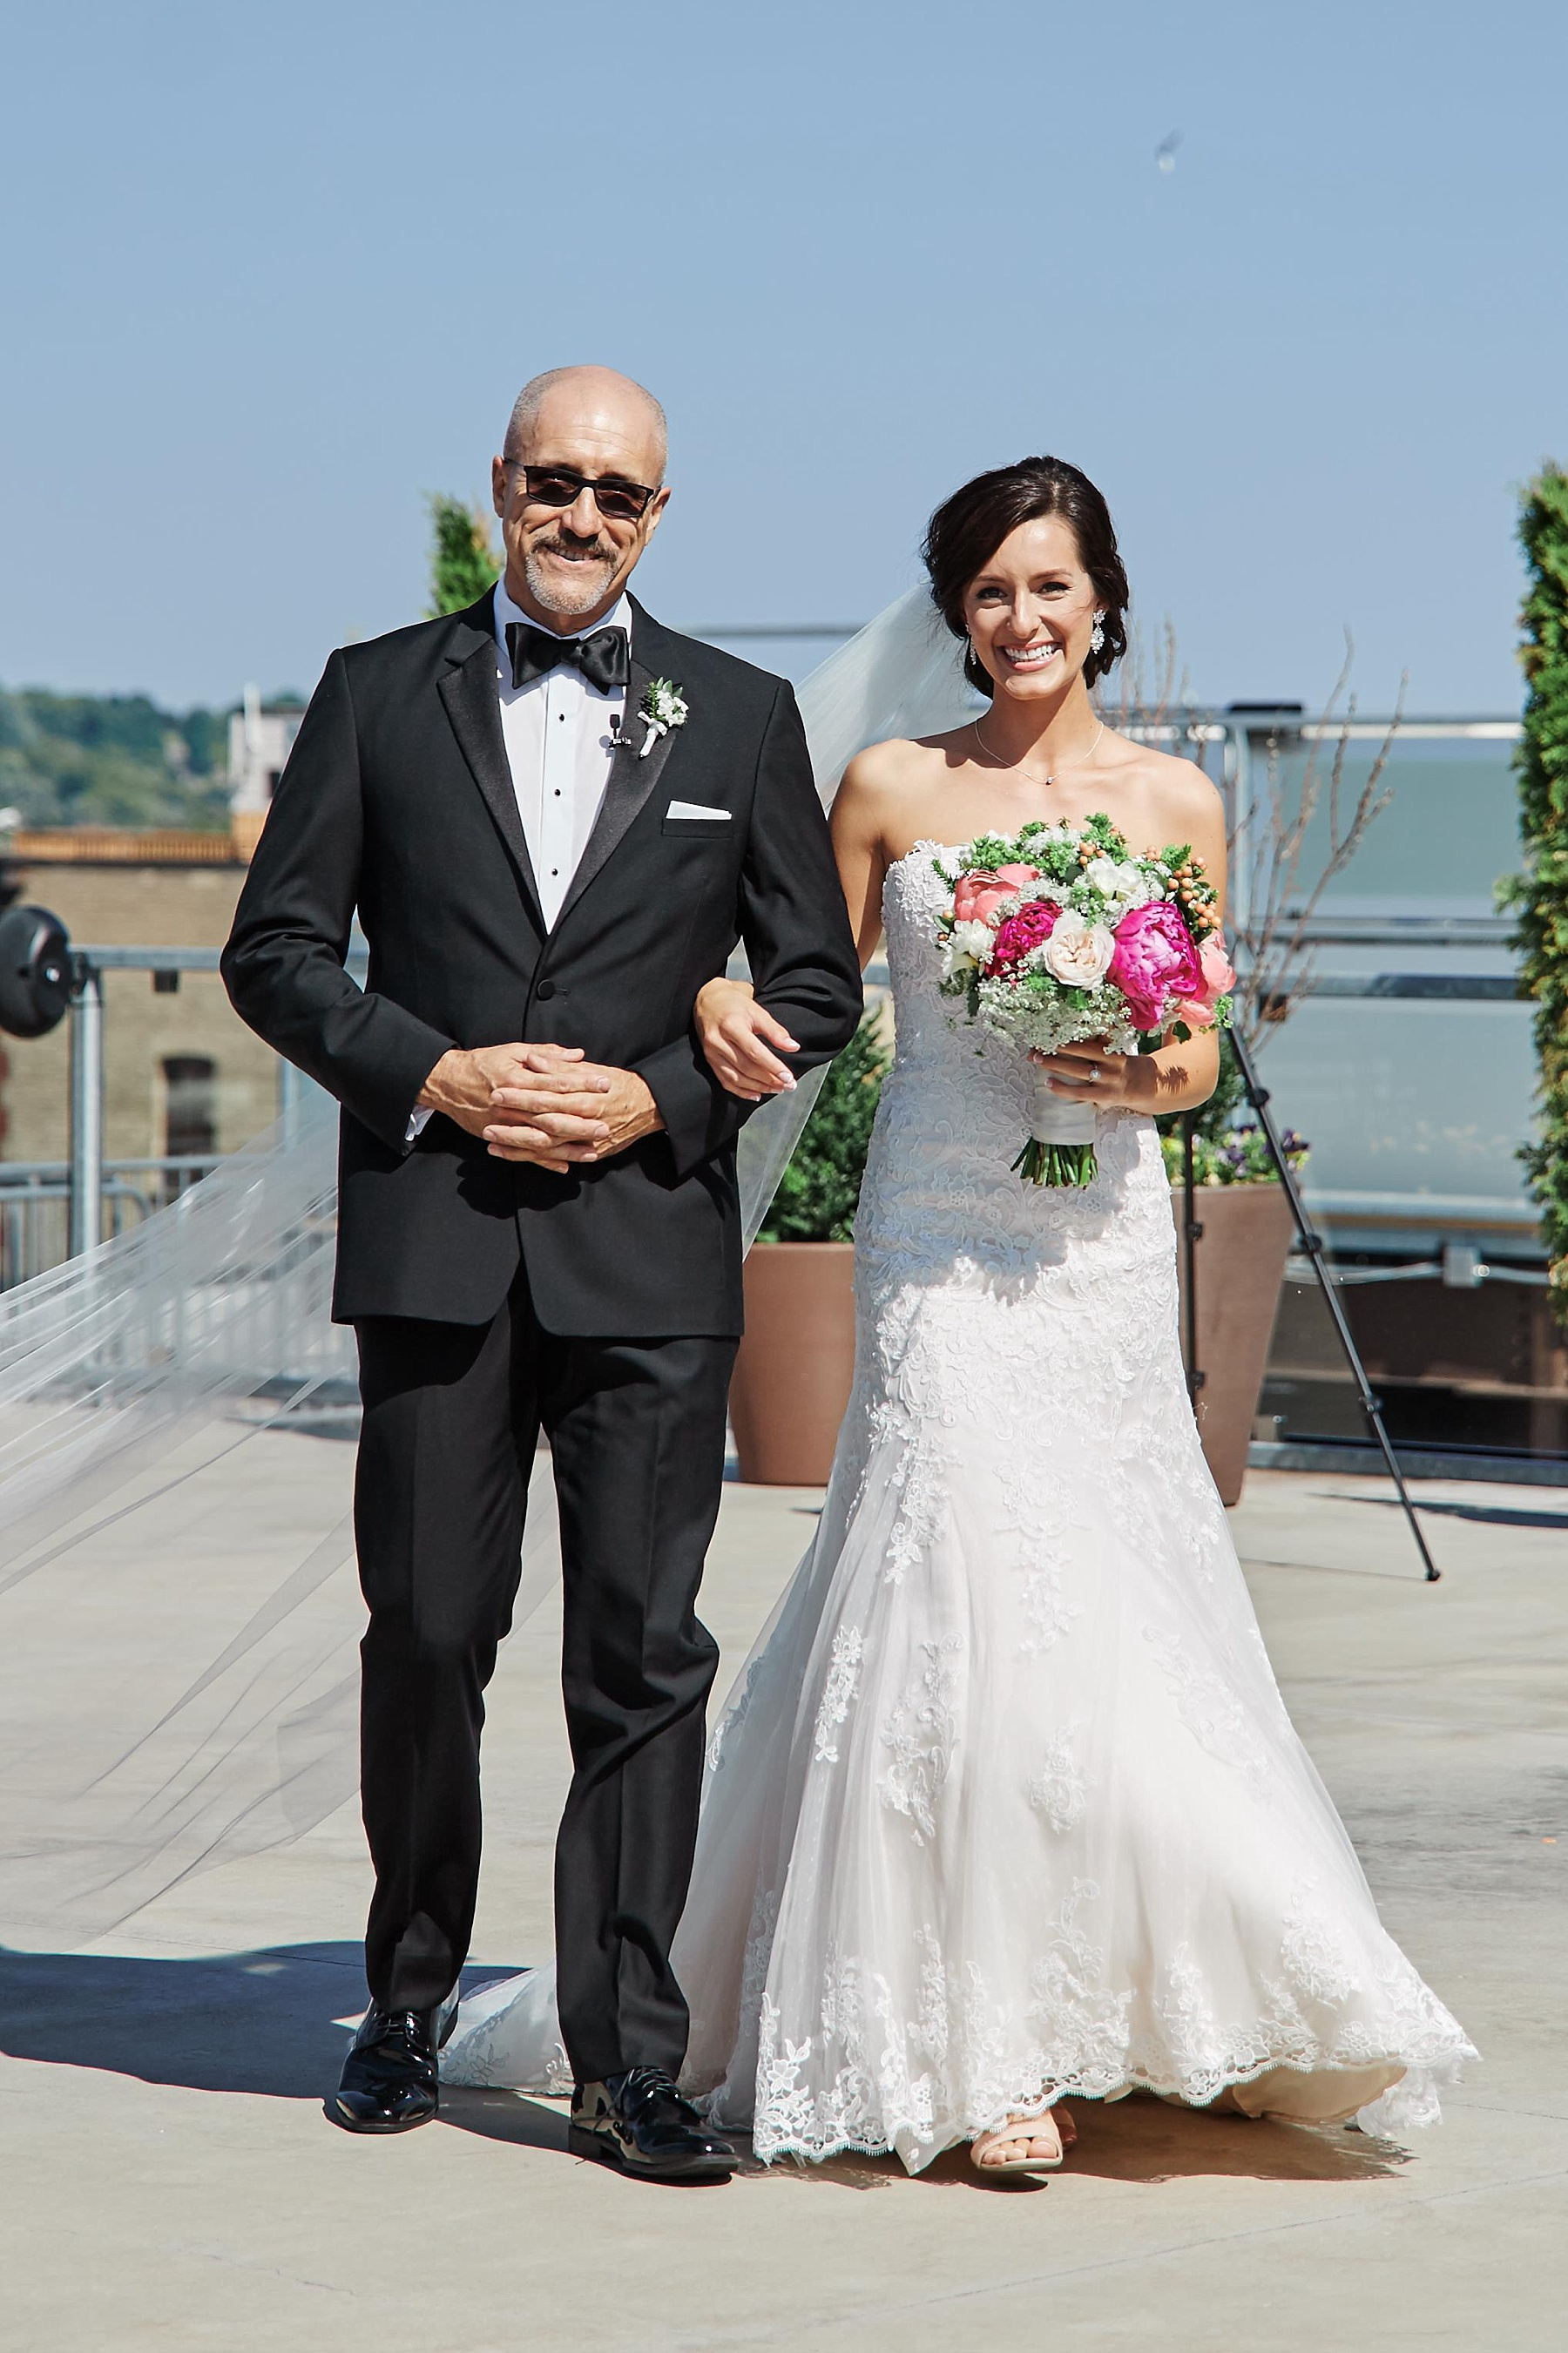 ABULAE-Wedding-Saint-paul-MN-Josh-Sofia-Wedding-Mears-Park_0752.jpg